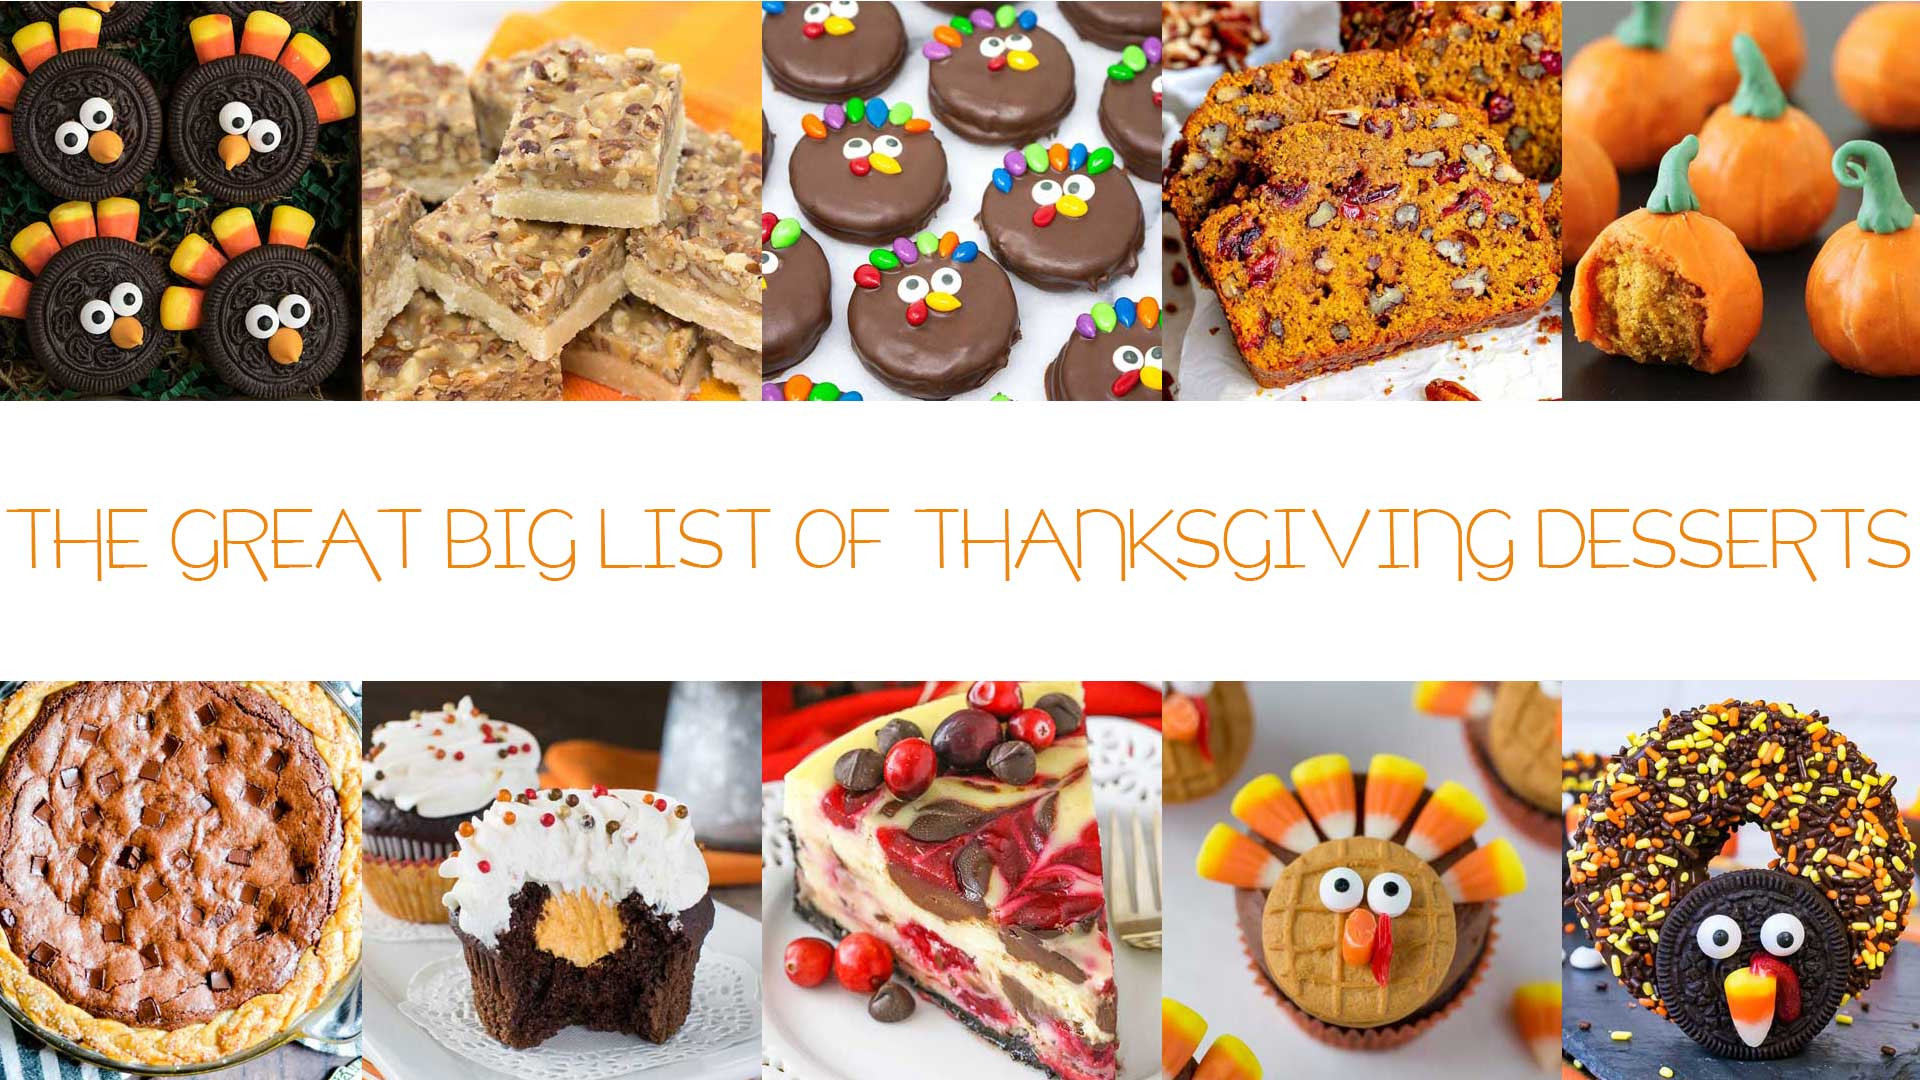 Thanksgiving Desserts List  The Great Big List of Thanksgiving Desserts • Sarahs Bake